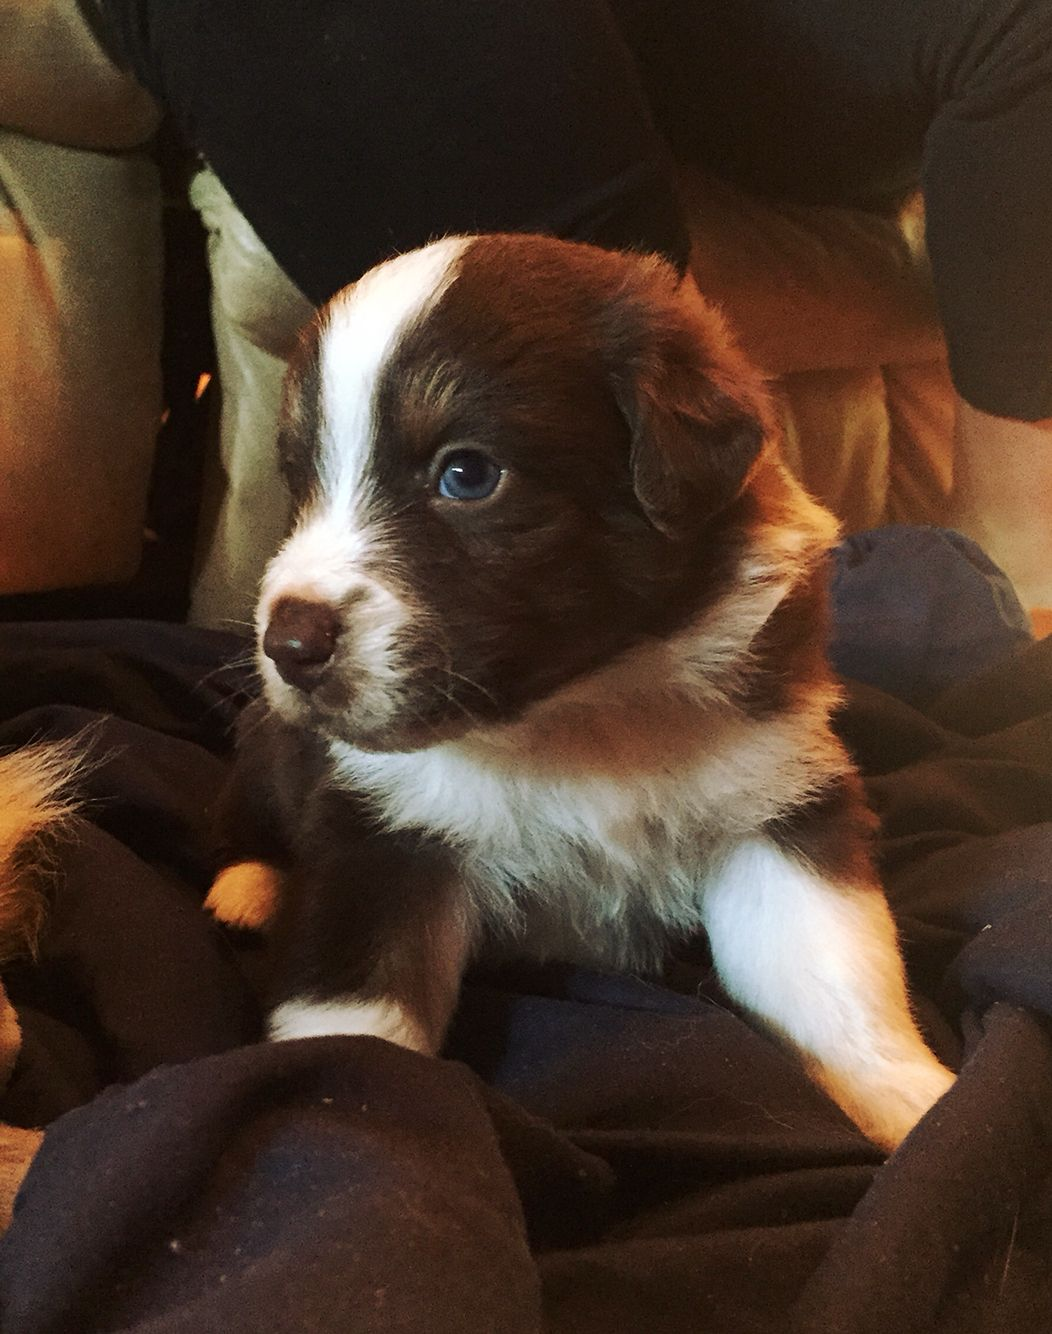 Red Tri Australian Shepherd Puppy At 3 1 2 Weeks My Little Guy I